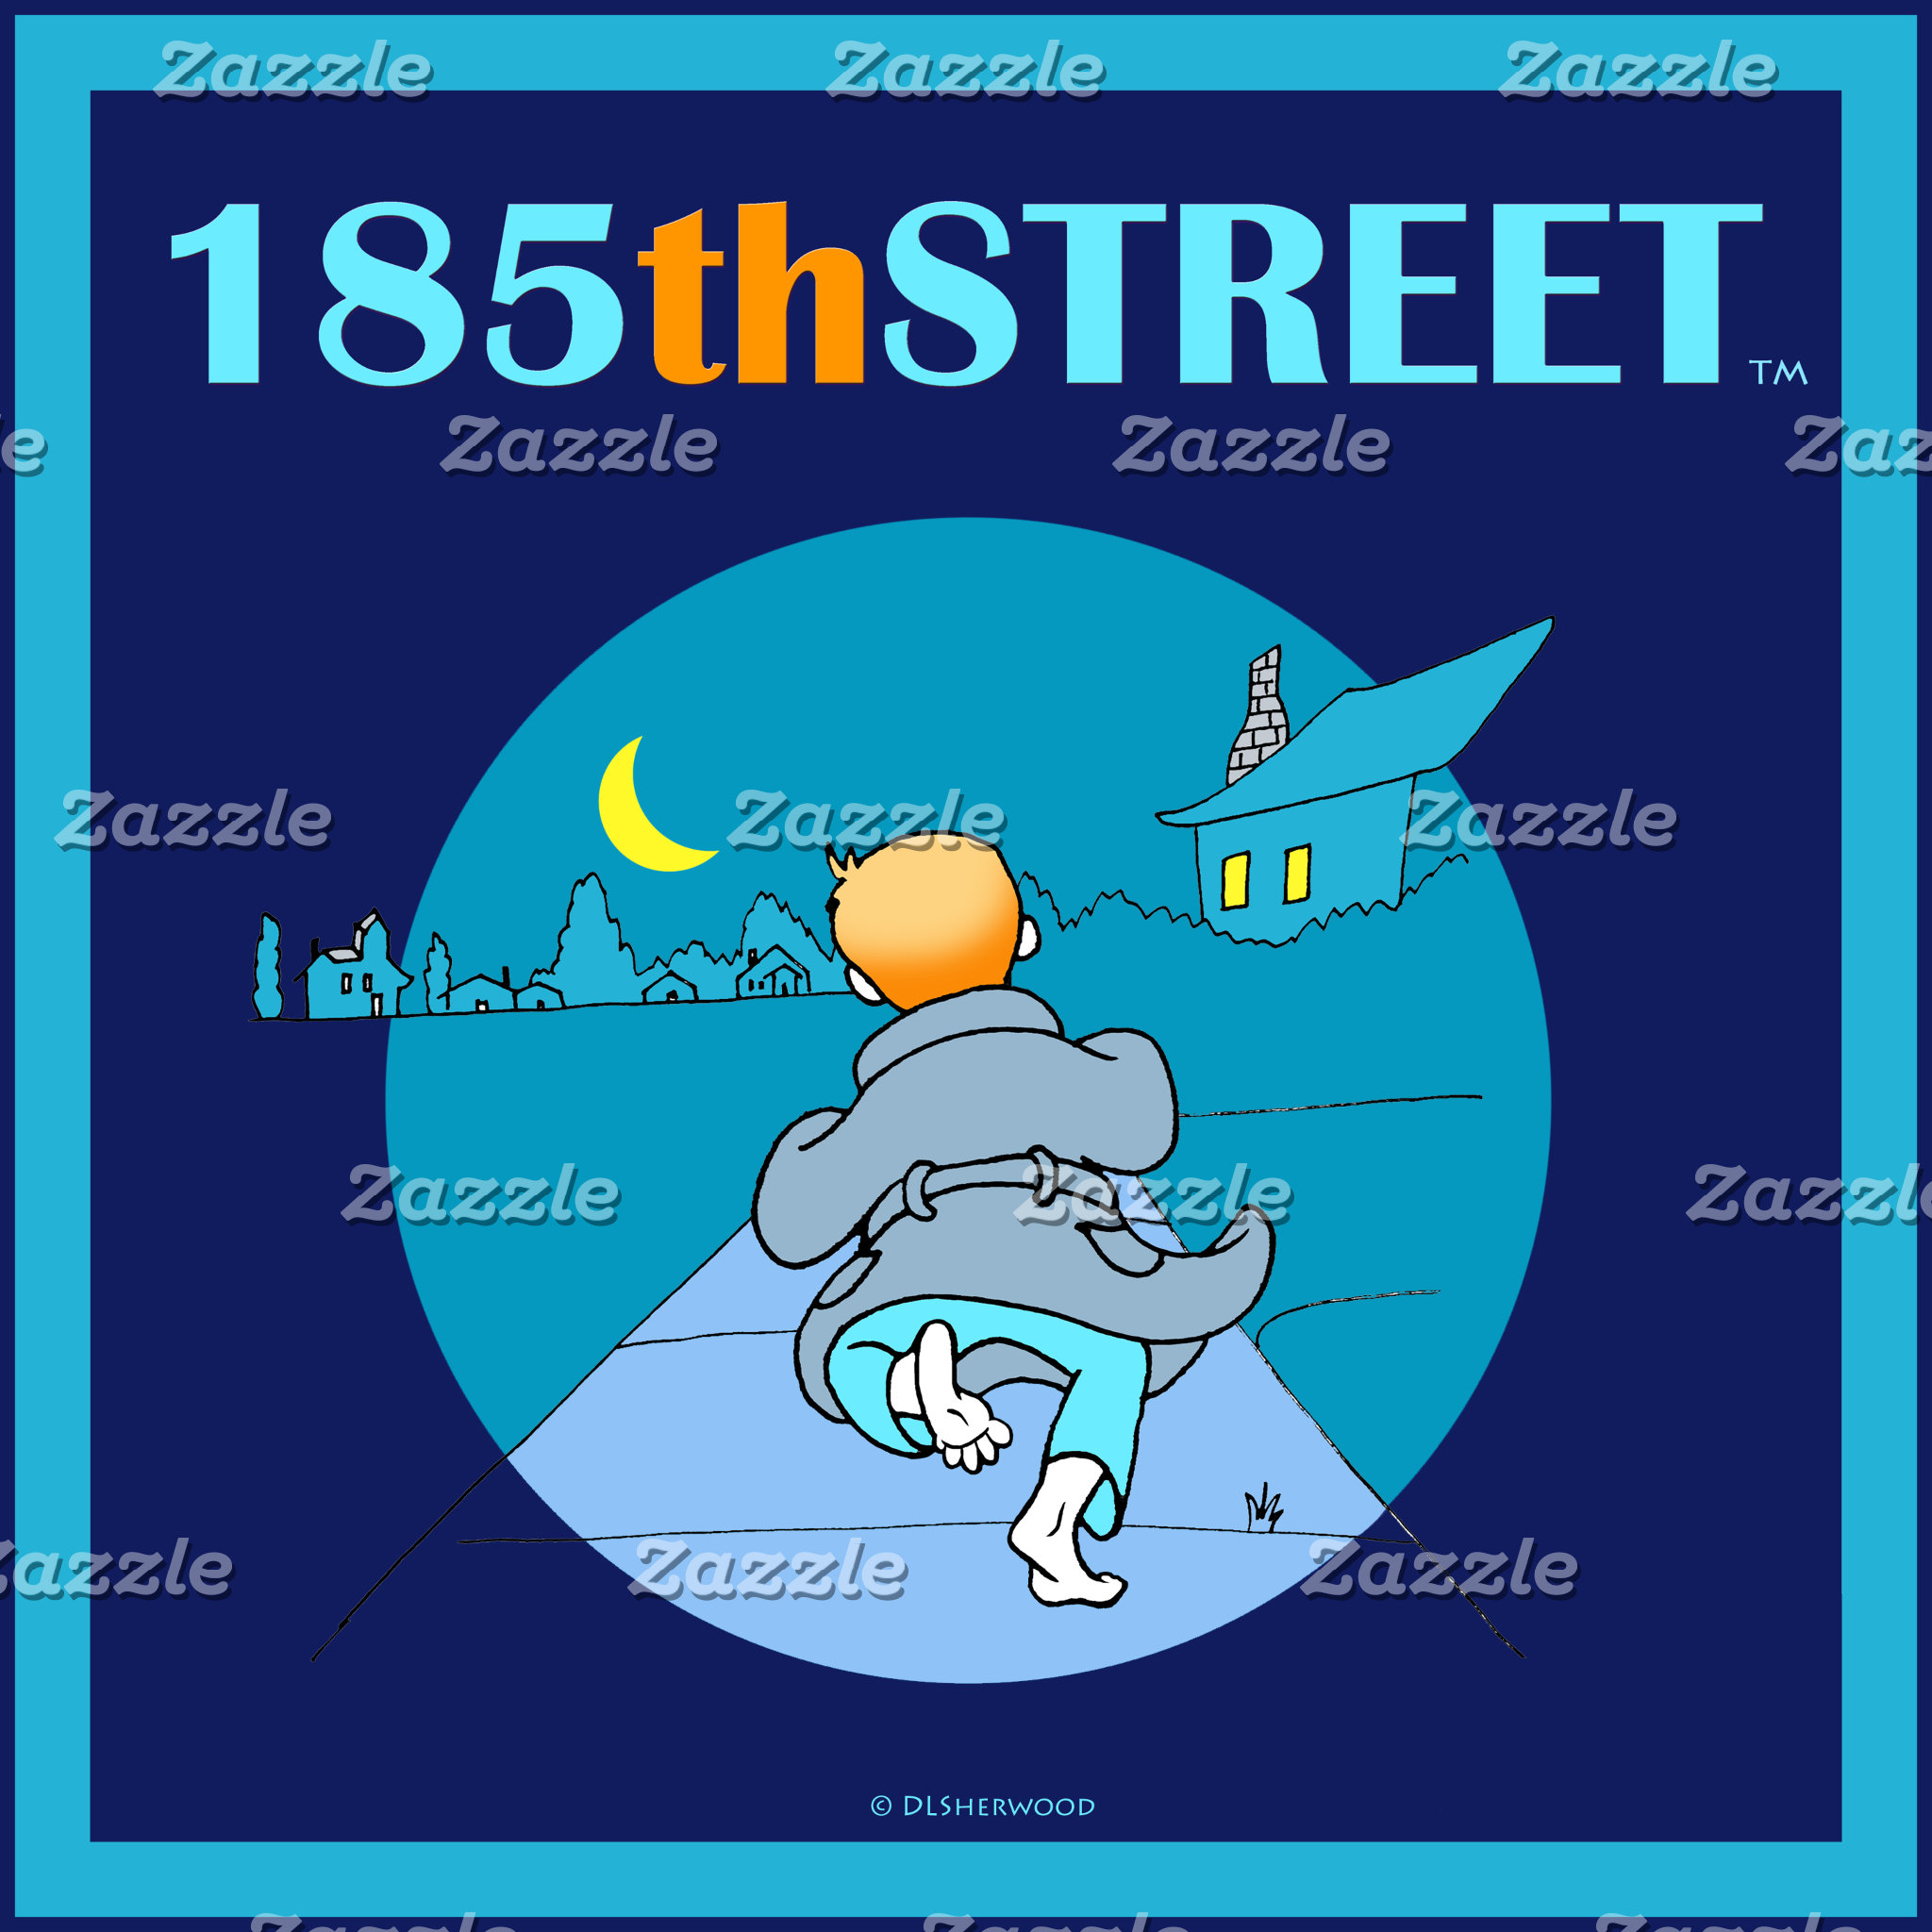 185thSTREET Logo Merch